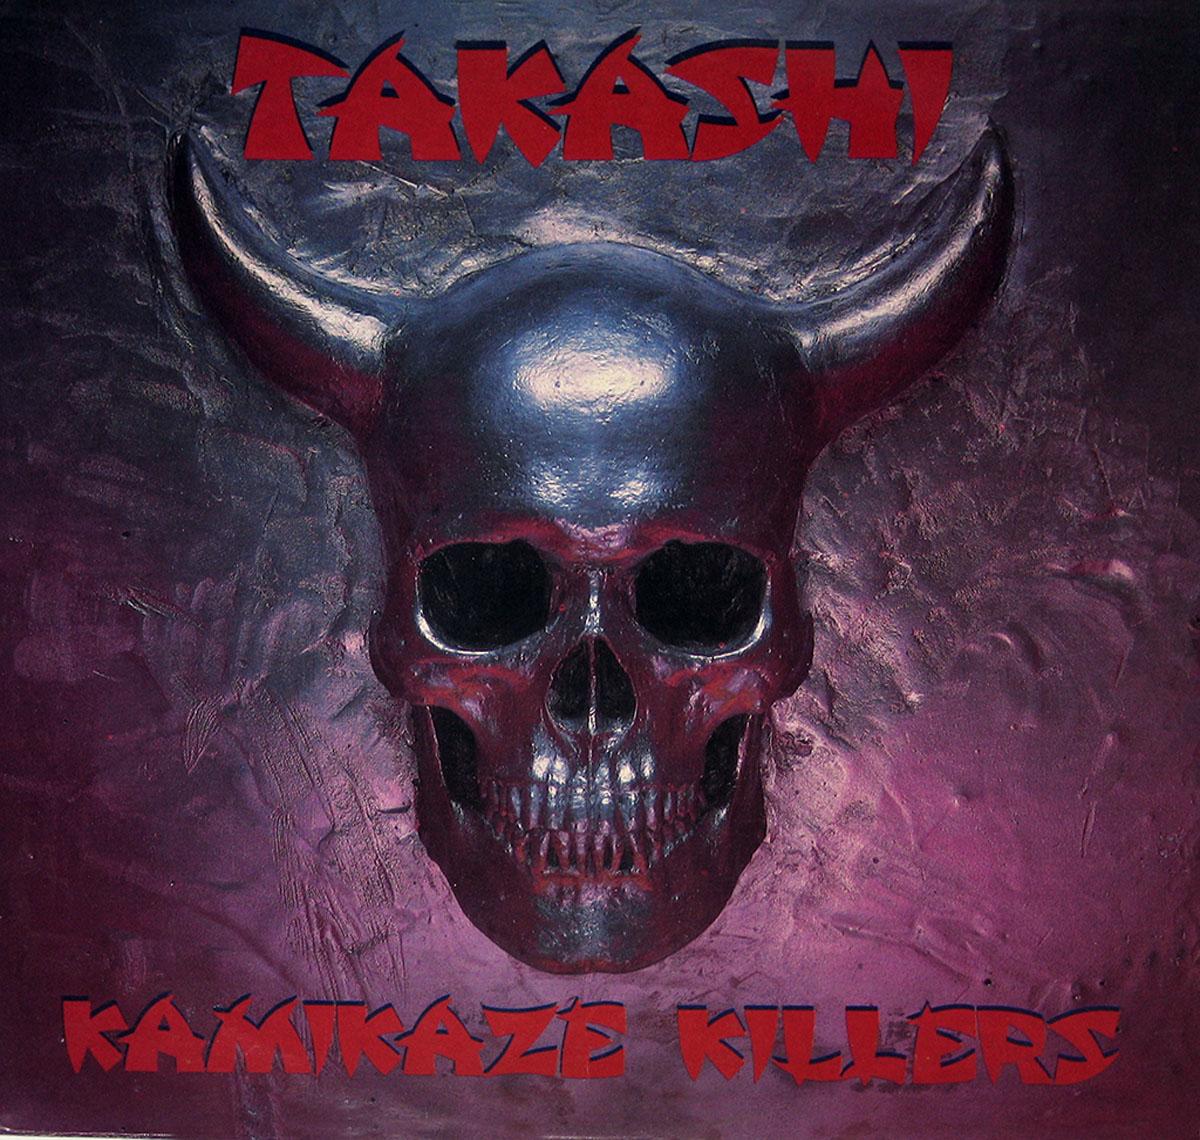 High Resolution Photo #10 takashi kamikaze killers